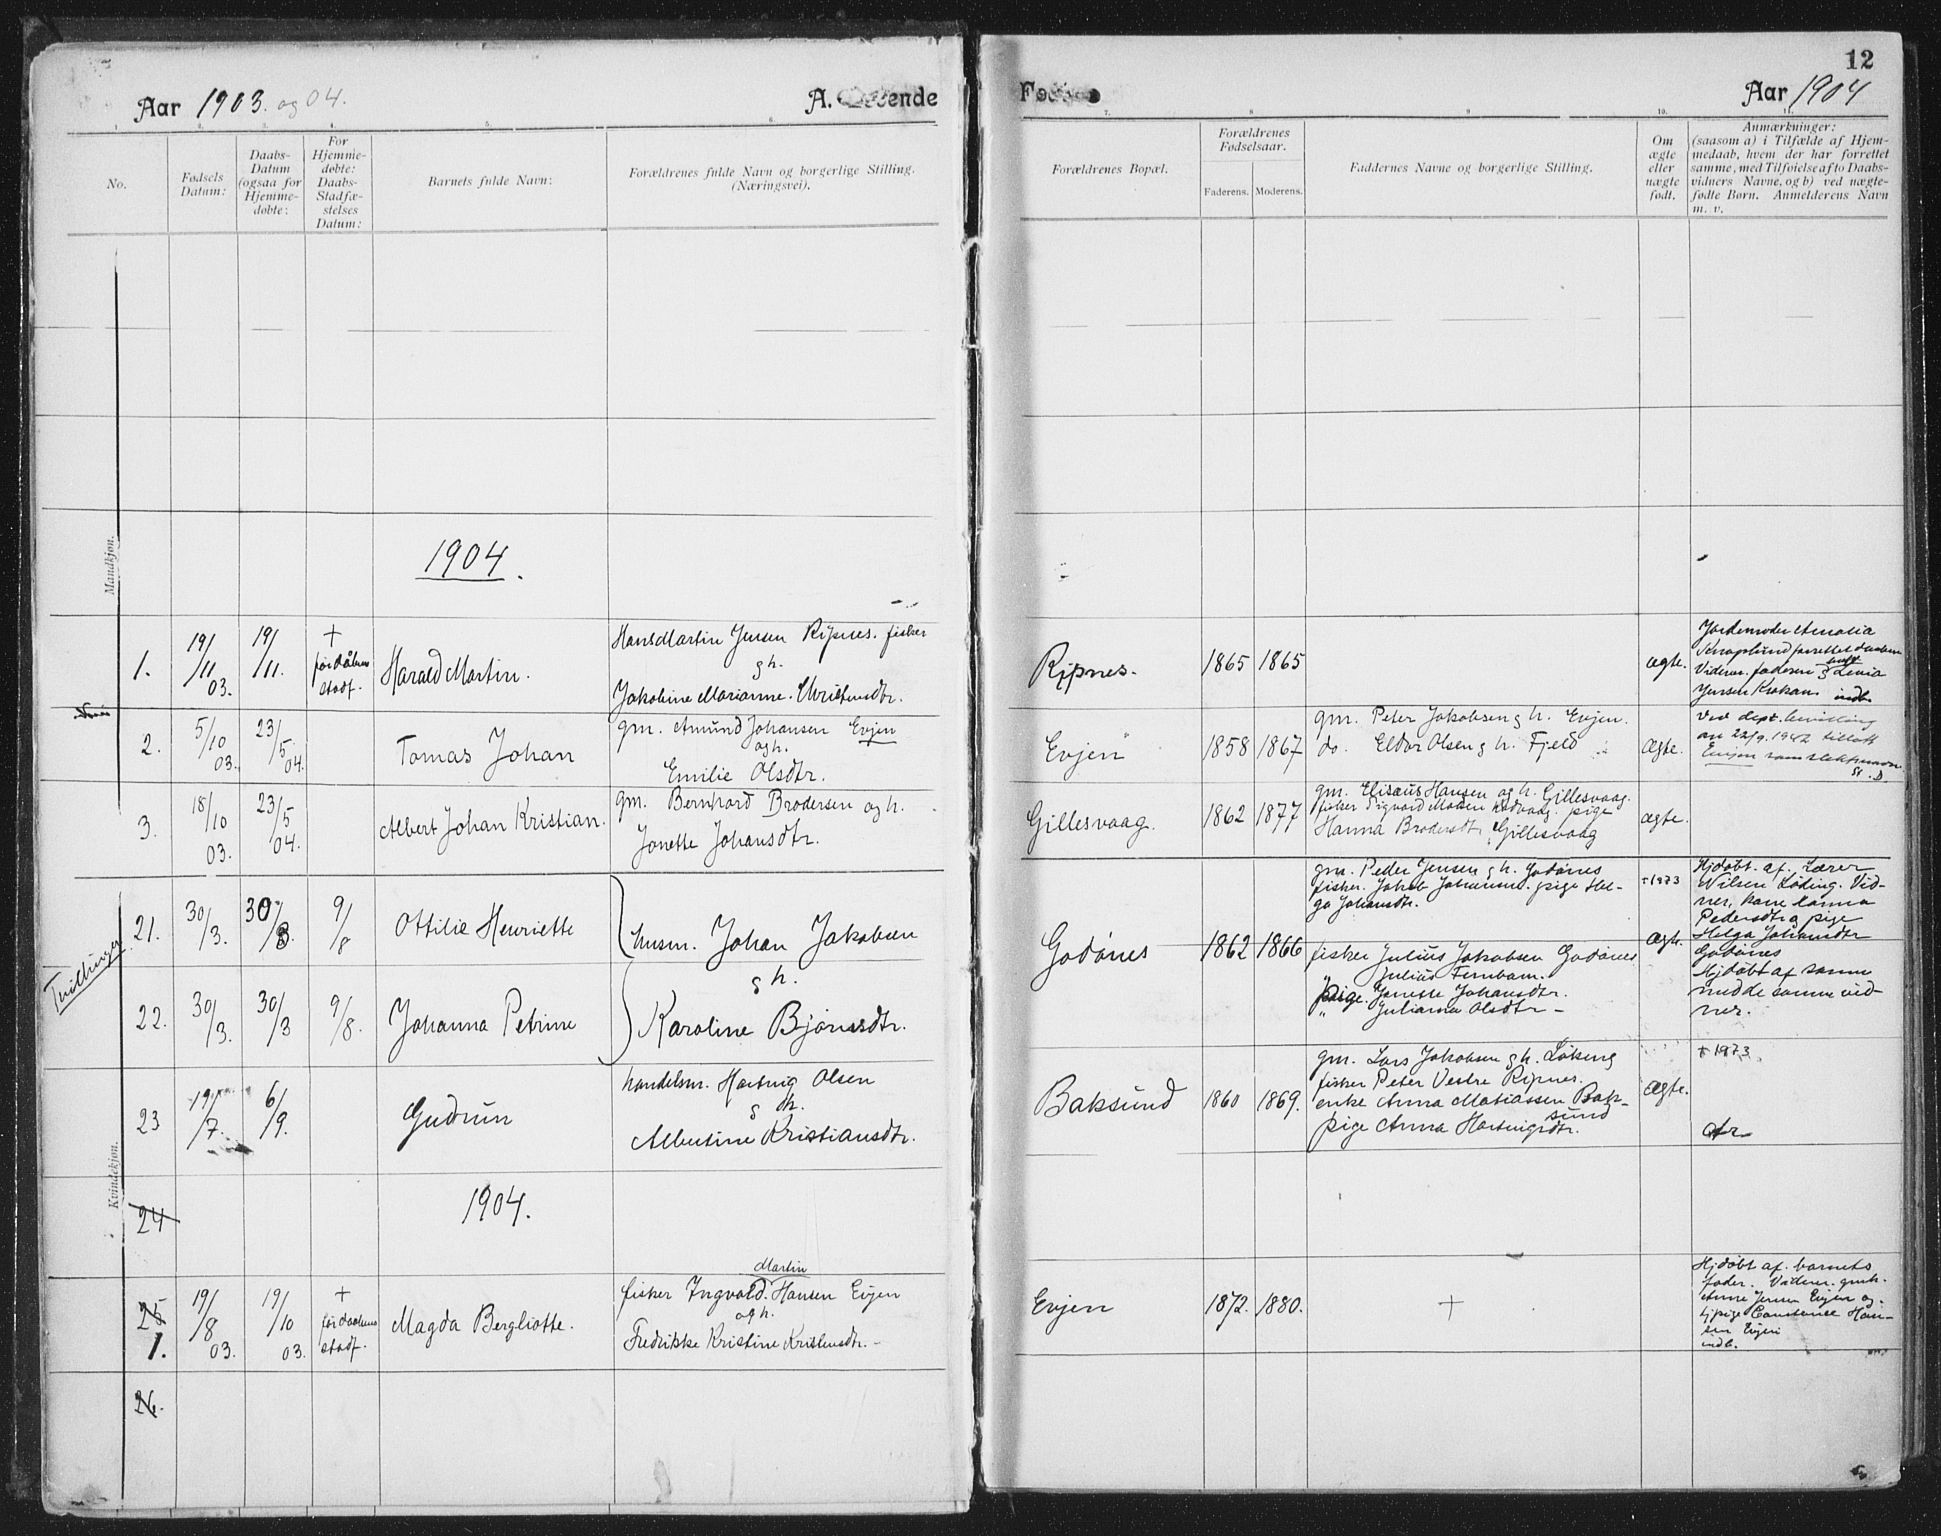 SAT, Ministerialprotokoller, klokkerbøker og fødselsregistre - Nordland, 804/L0081: Ministerialbok nr. 804A02, 1901-1915, s. 12